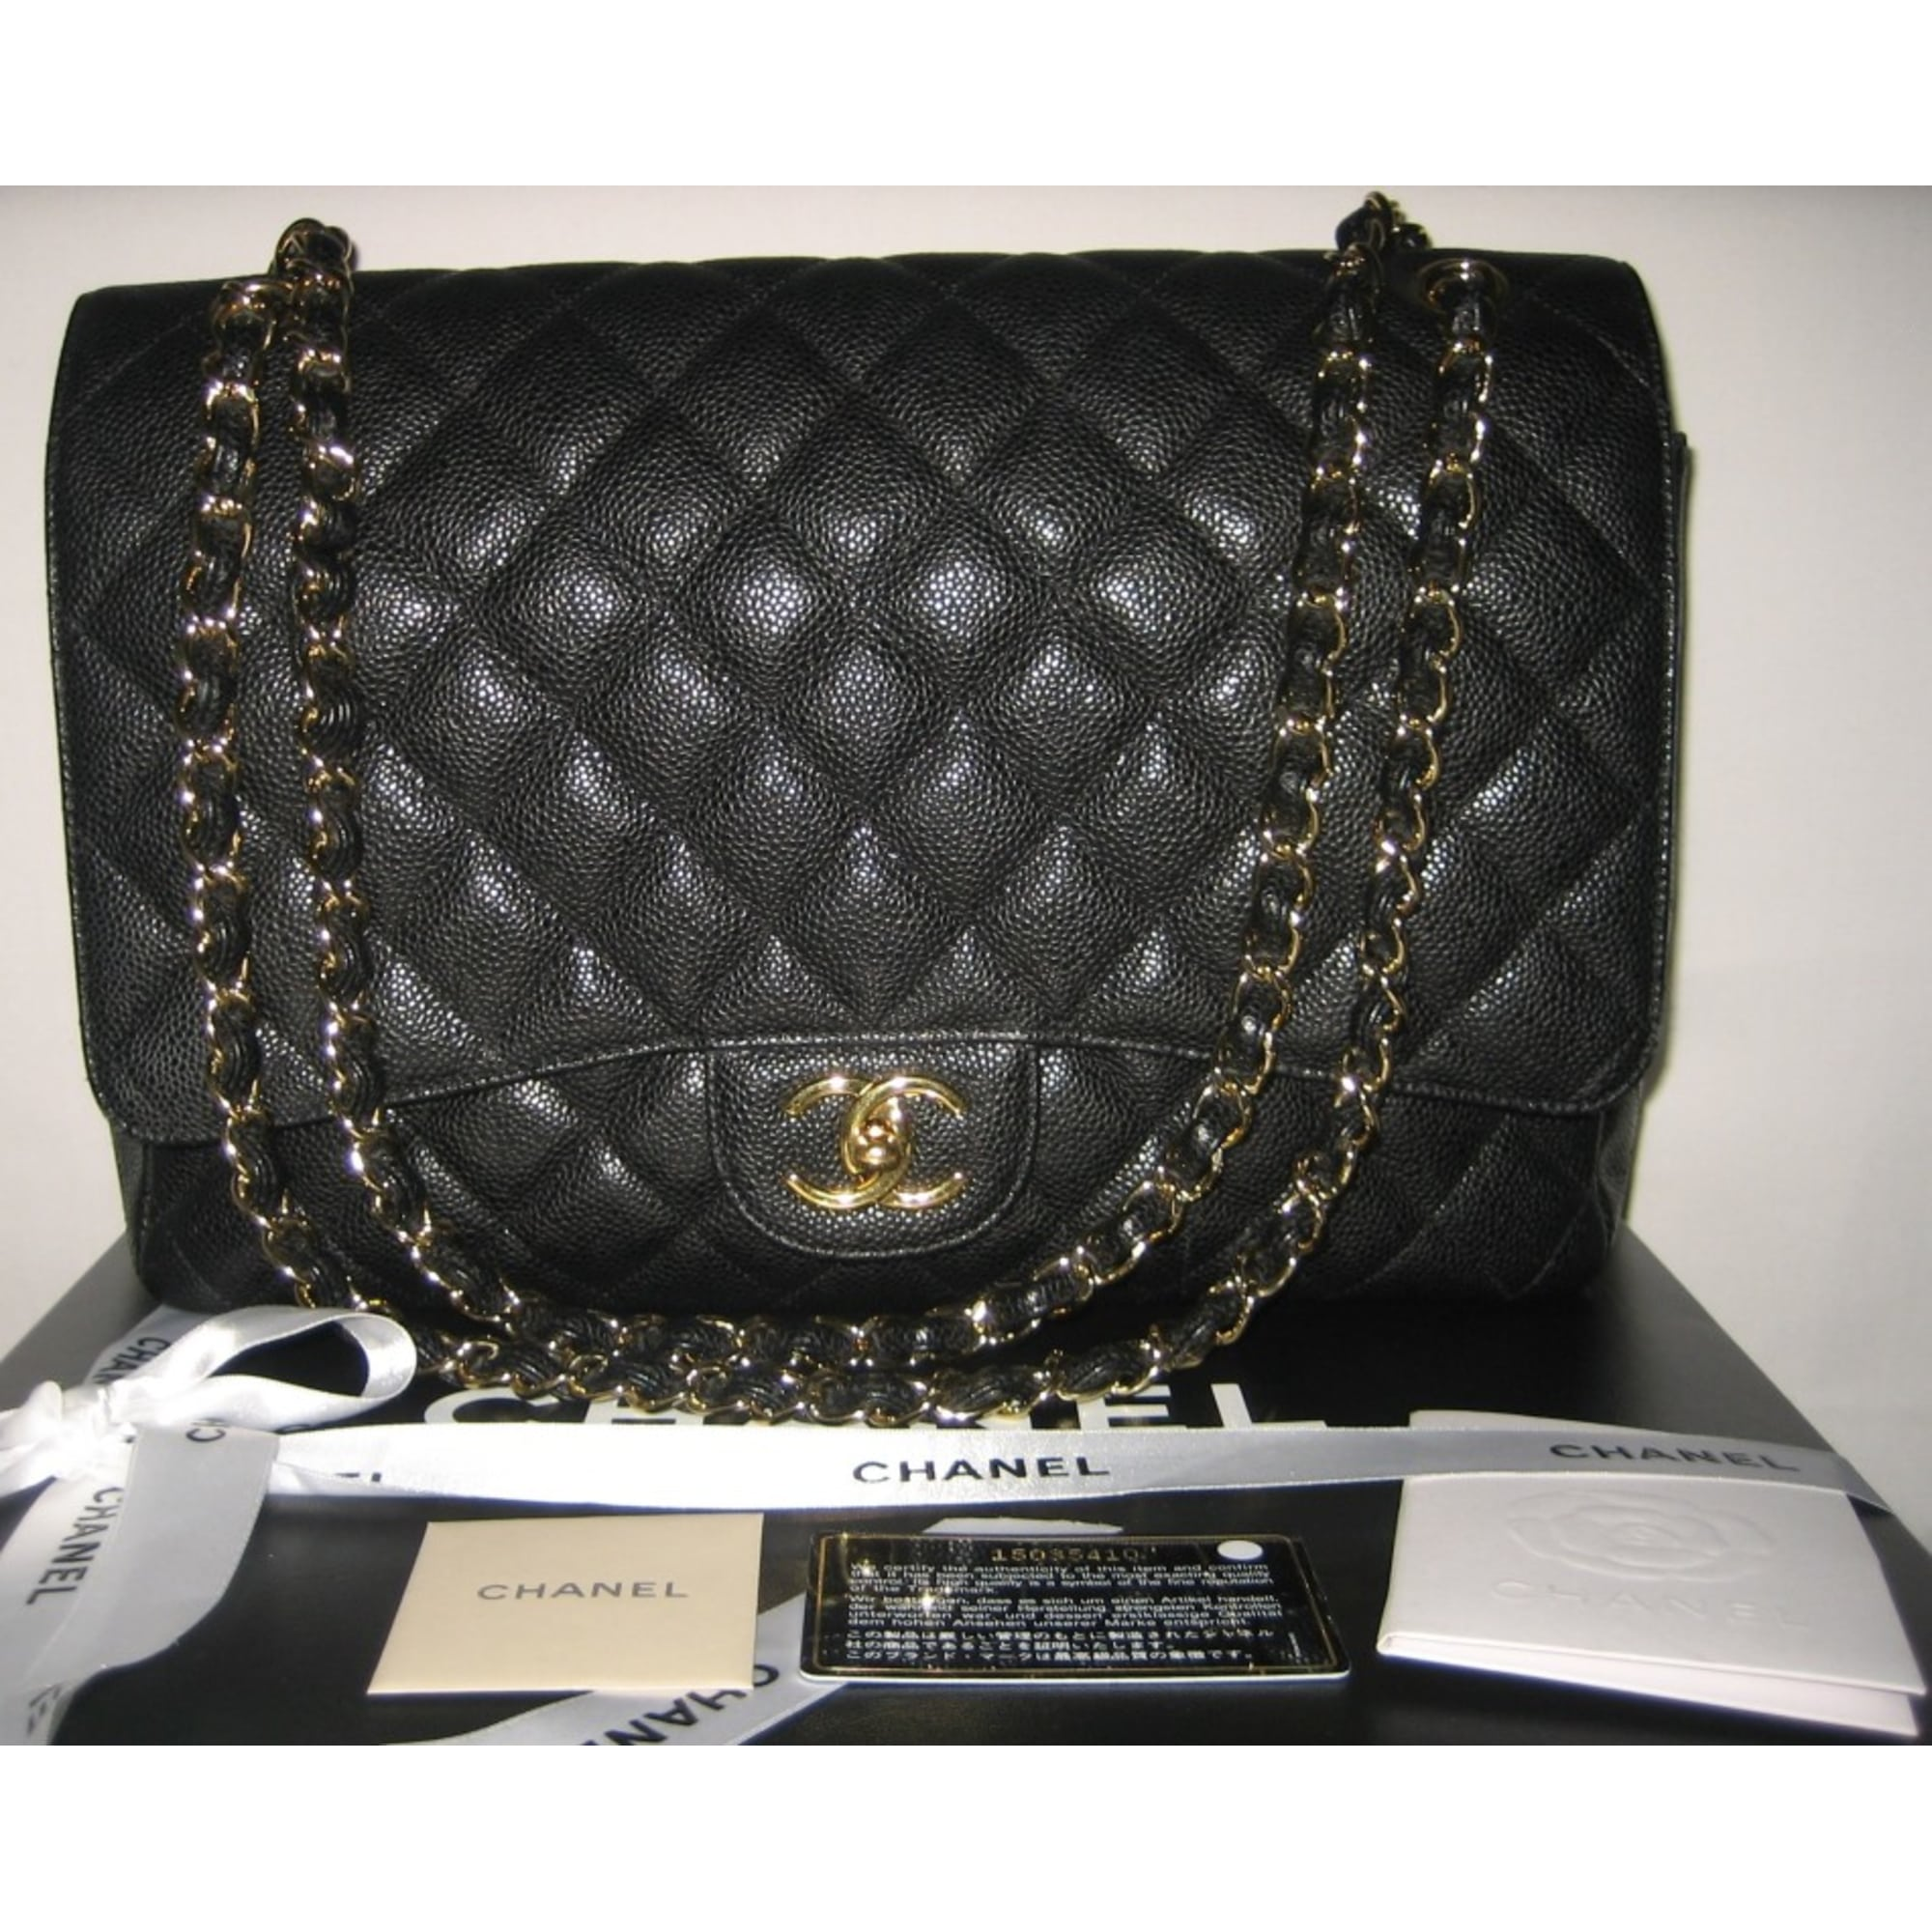 Sac à main en cuir CHANEL noir vendu par Marianna s closet - 2329157 c7657f94990